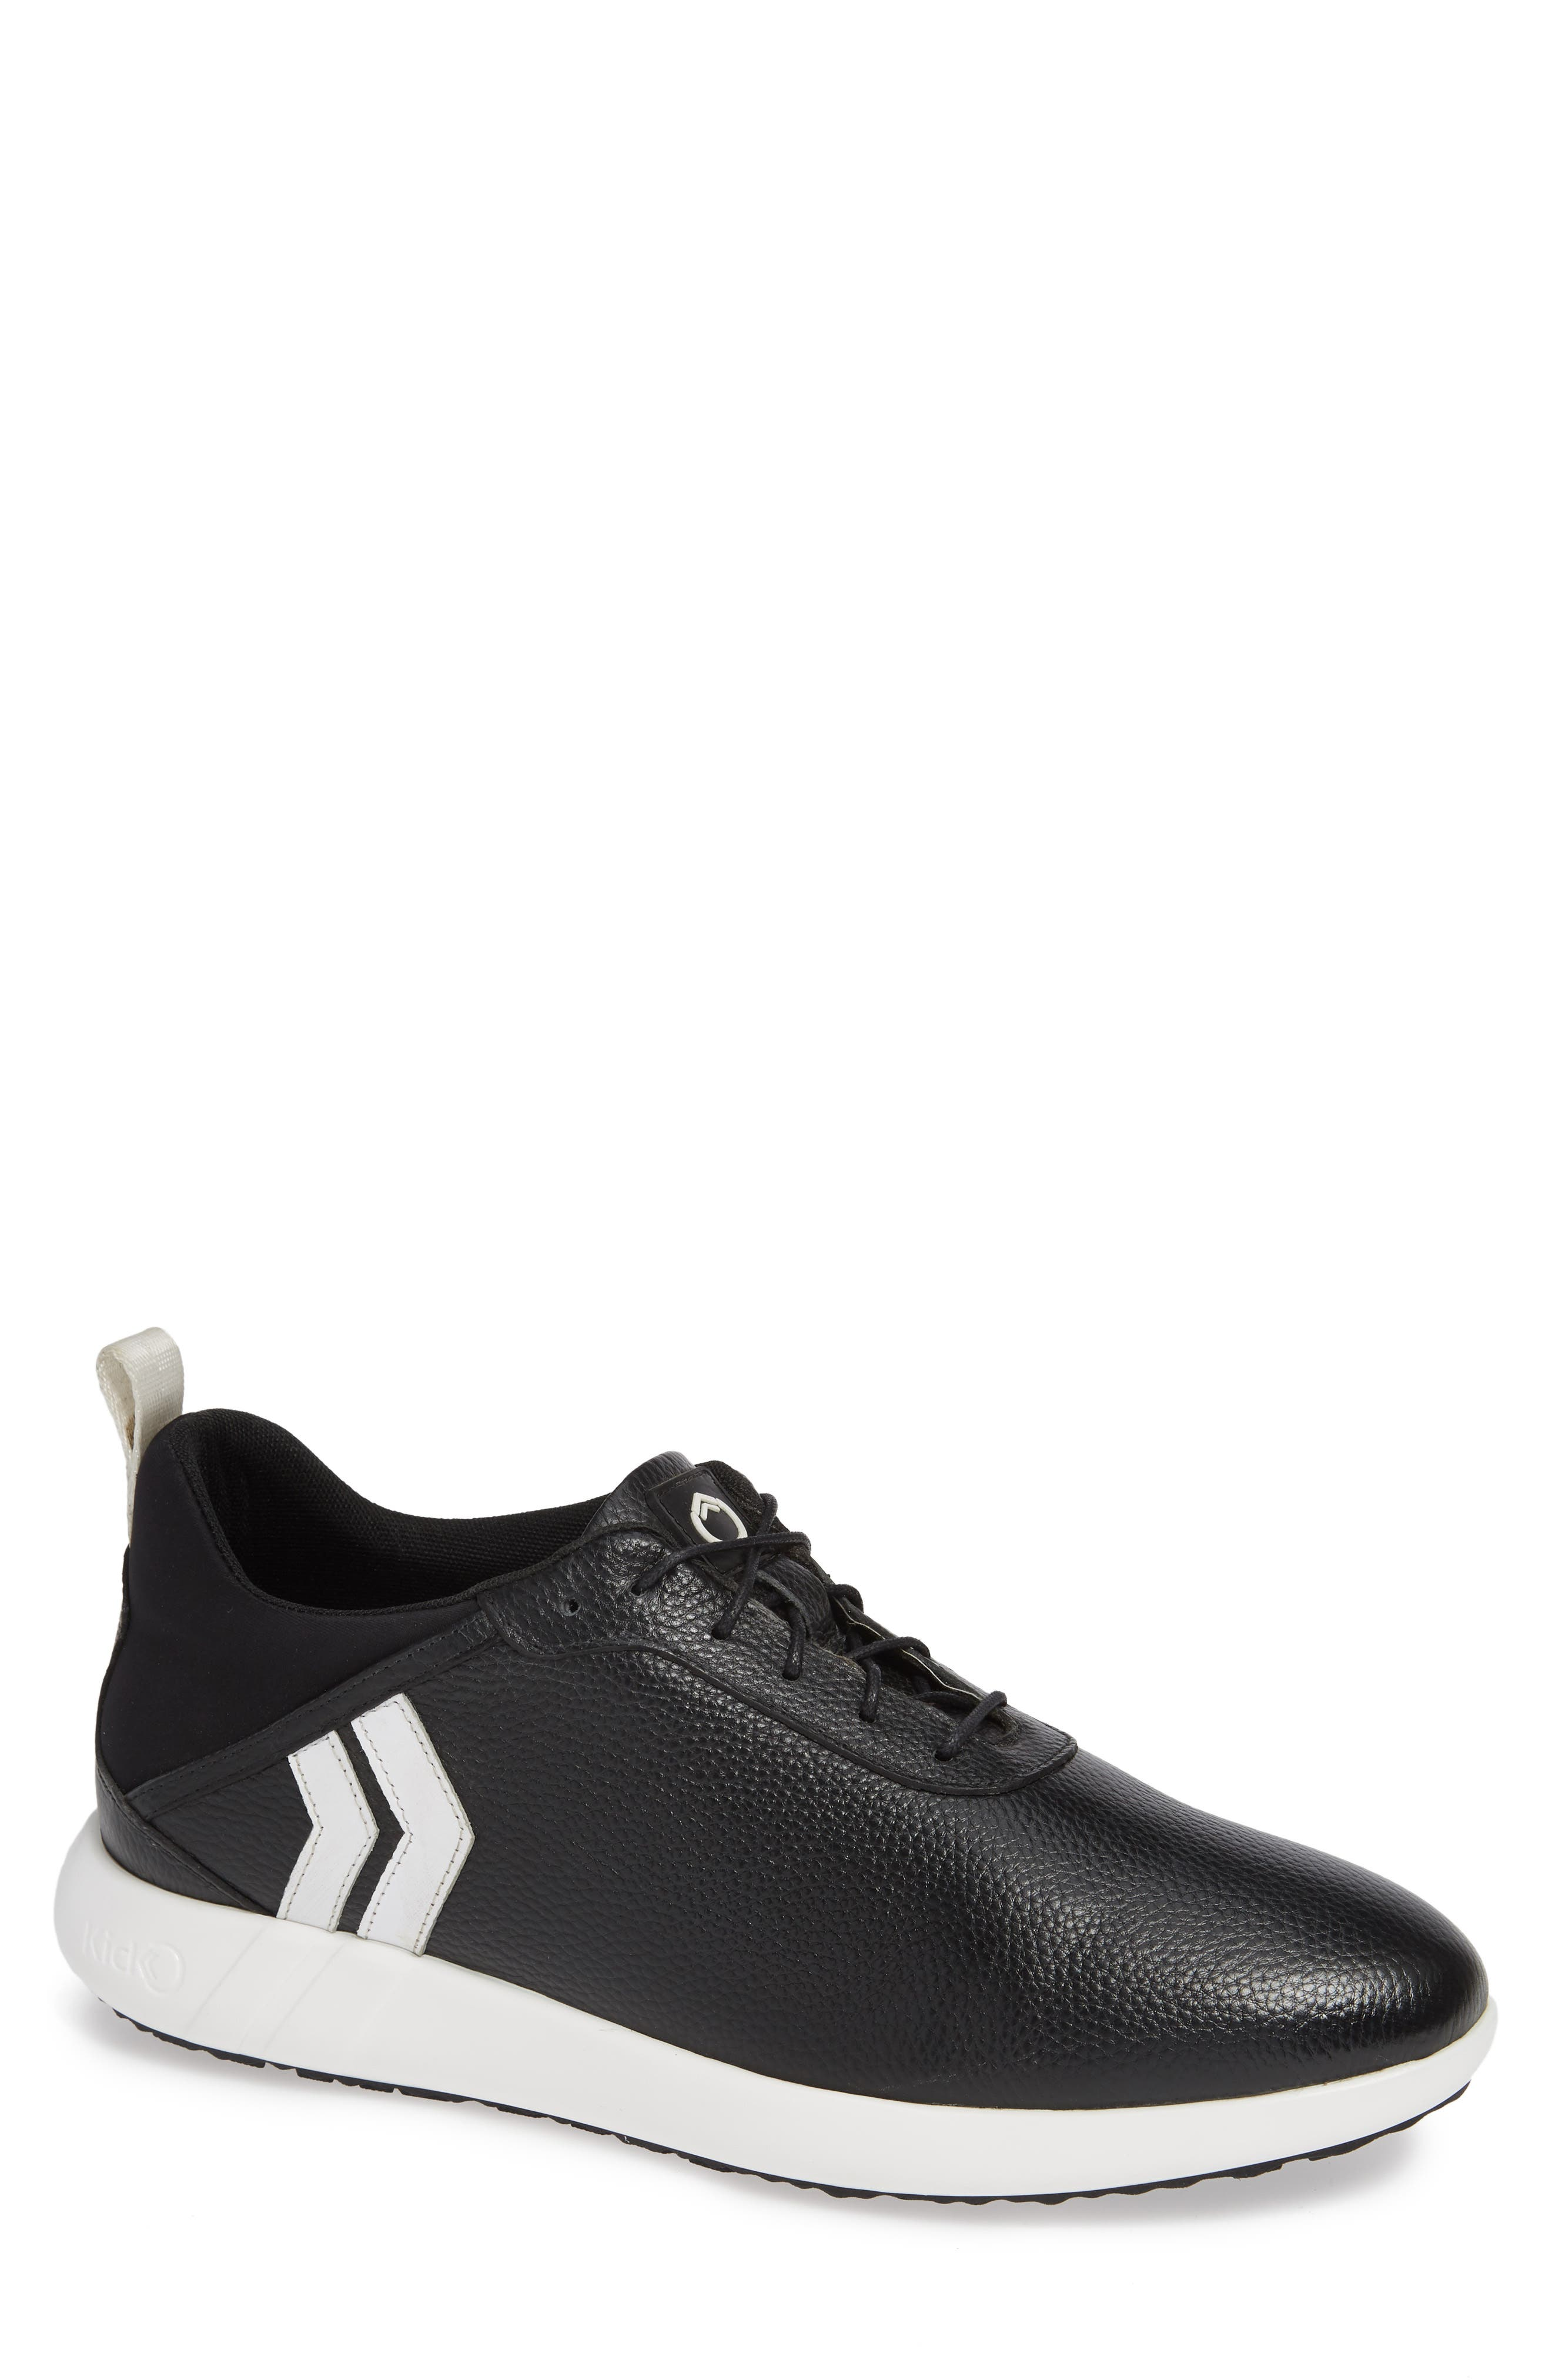 Flyer Sneaker,                             Main thumbnail 1, color,                             001